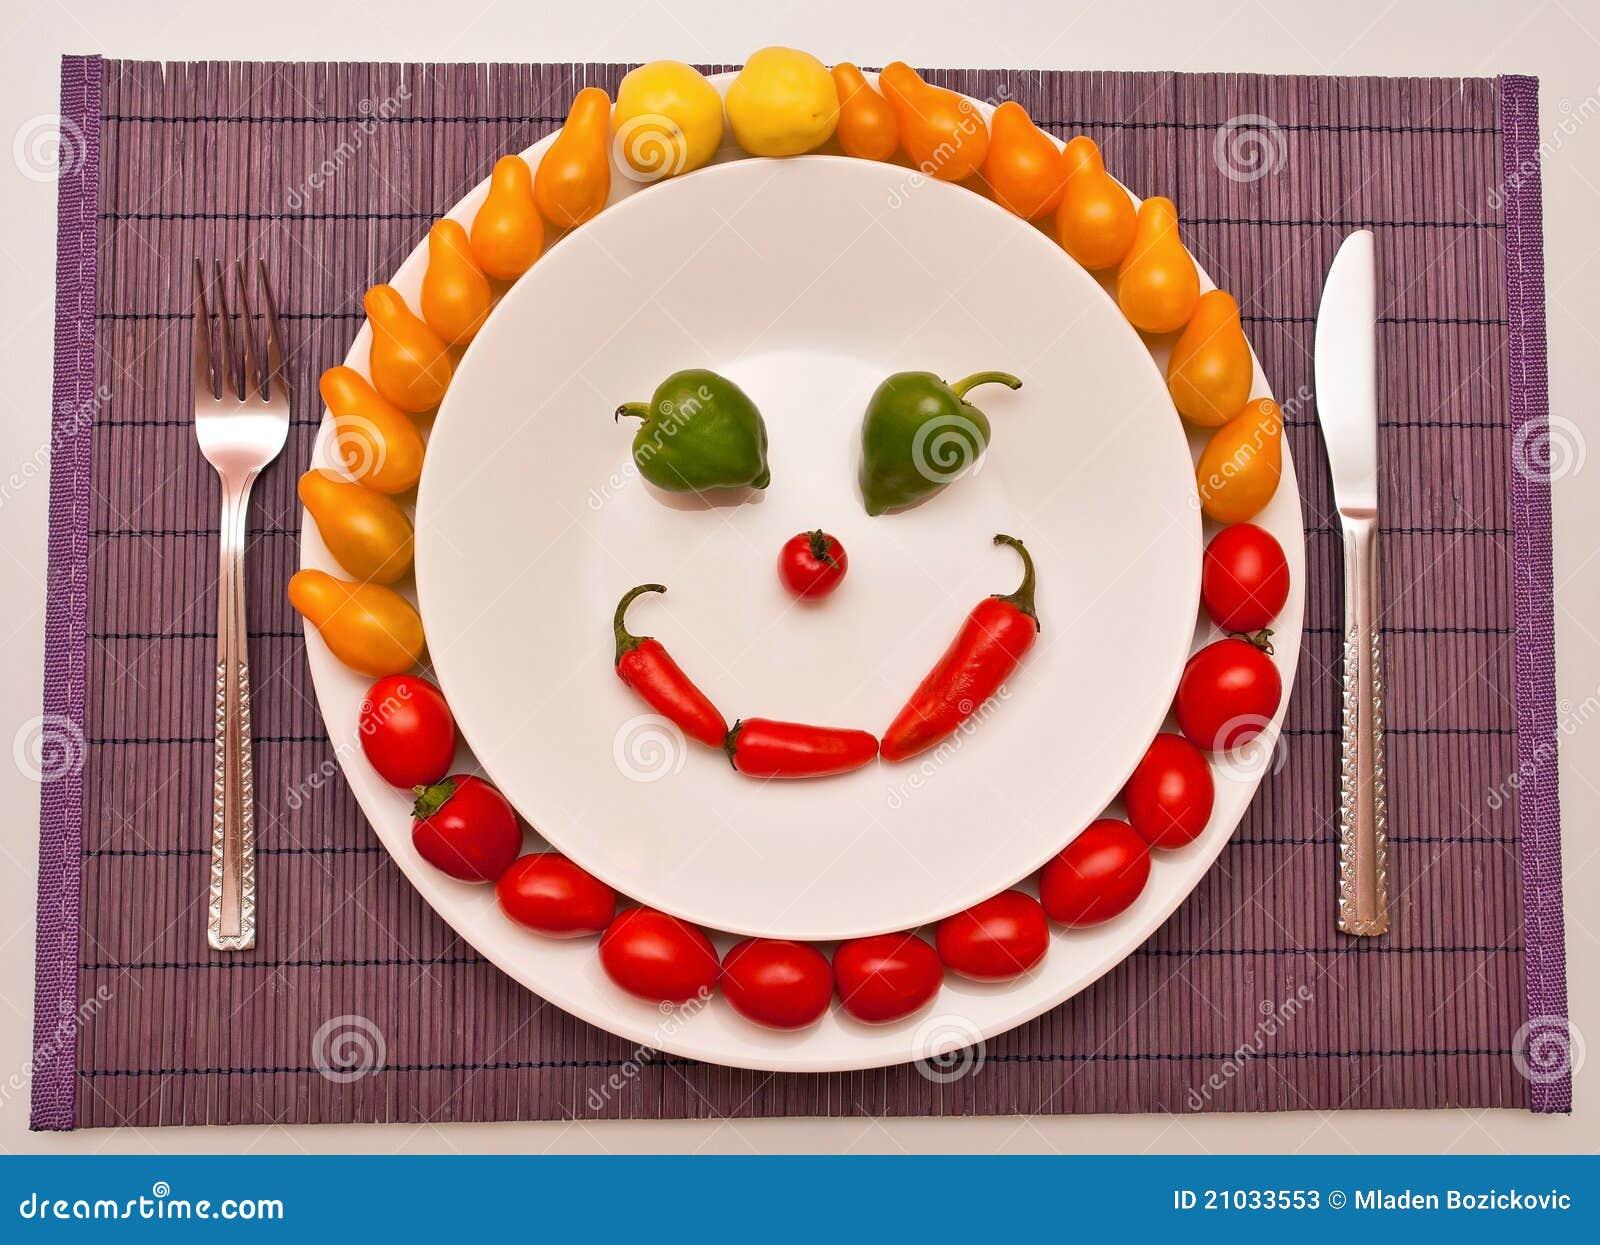 Happy Vegetables Stock Photos - Image: 21033553 Happy Vegetables